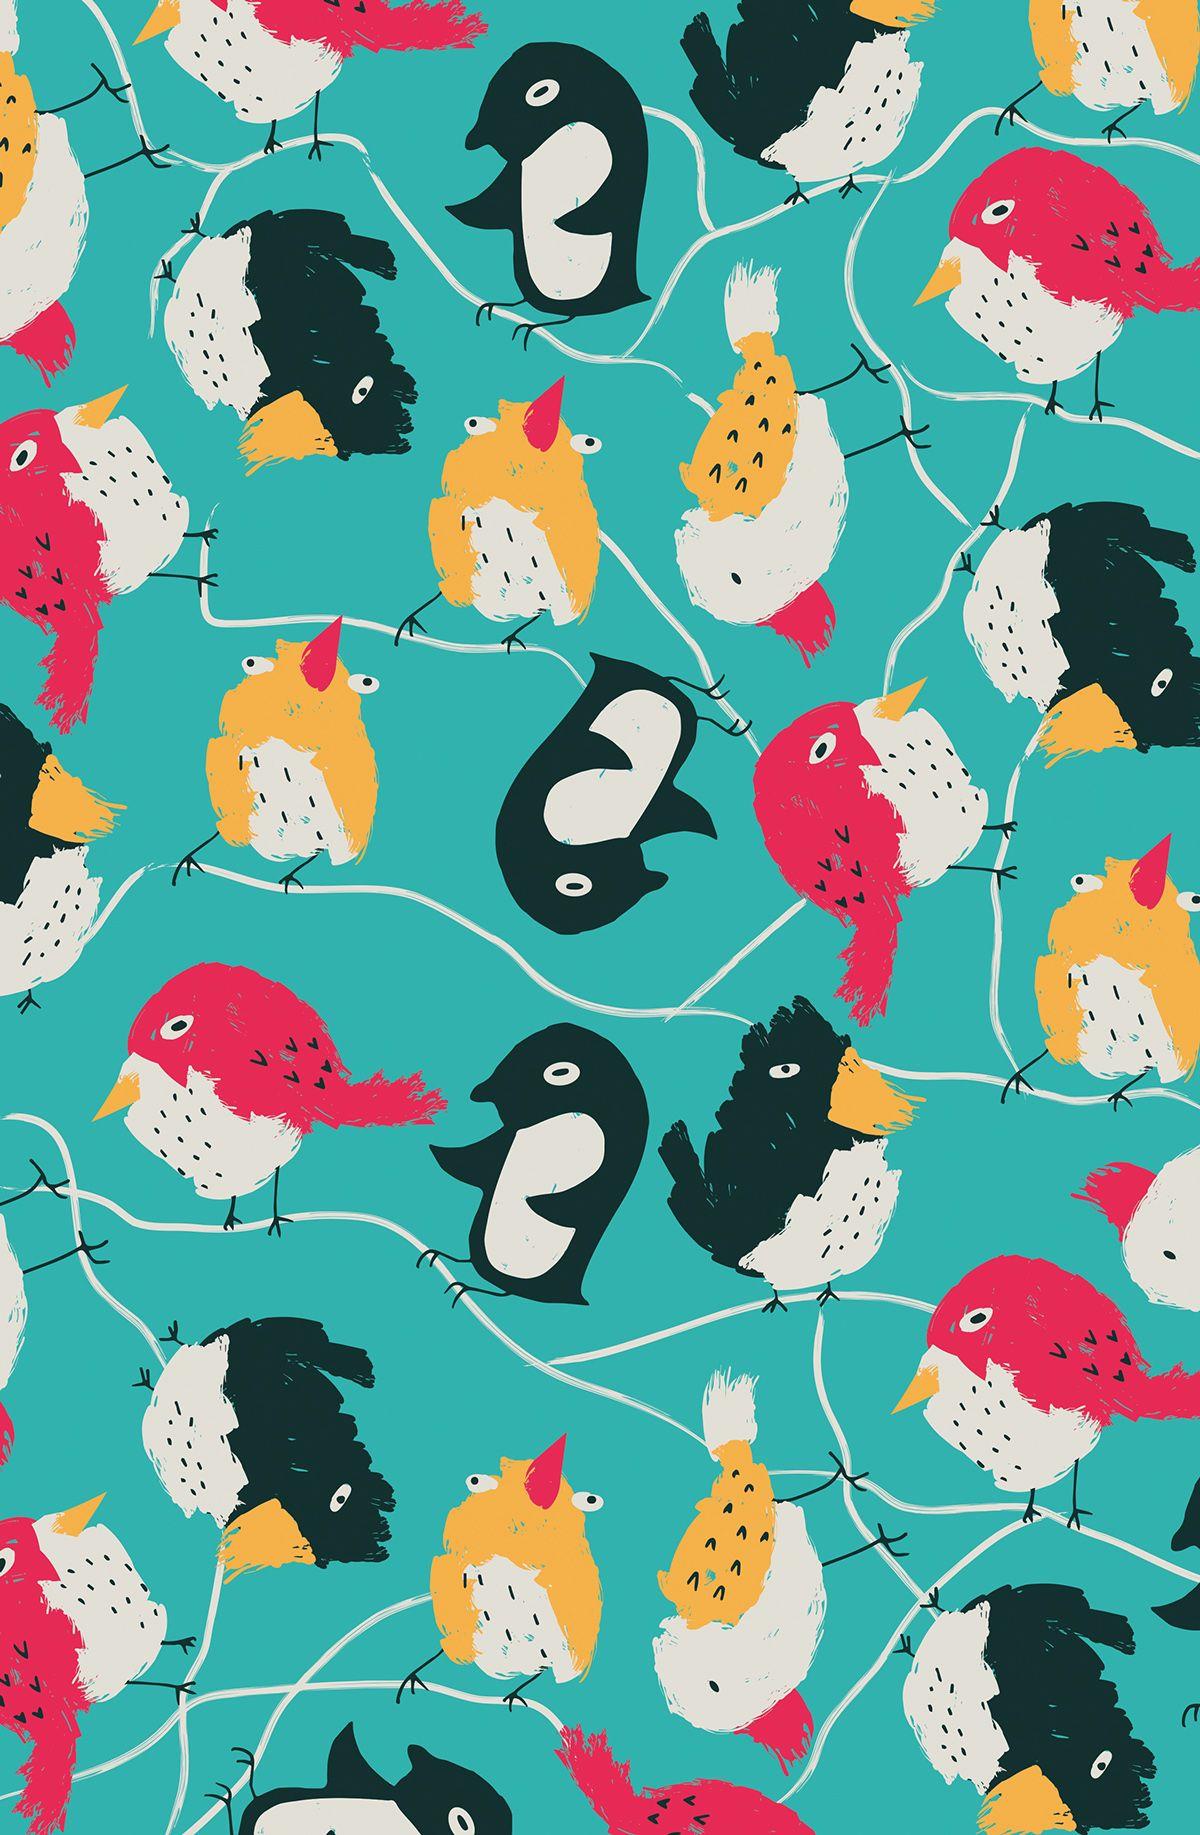 Patterns 2015 on Behance